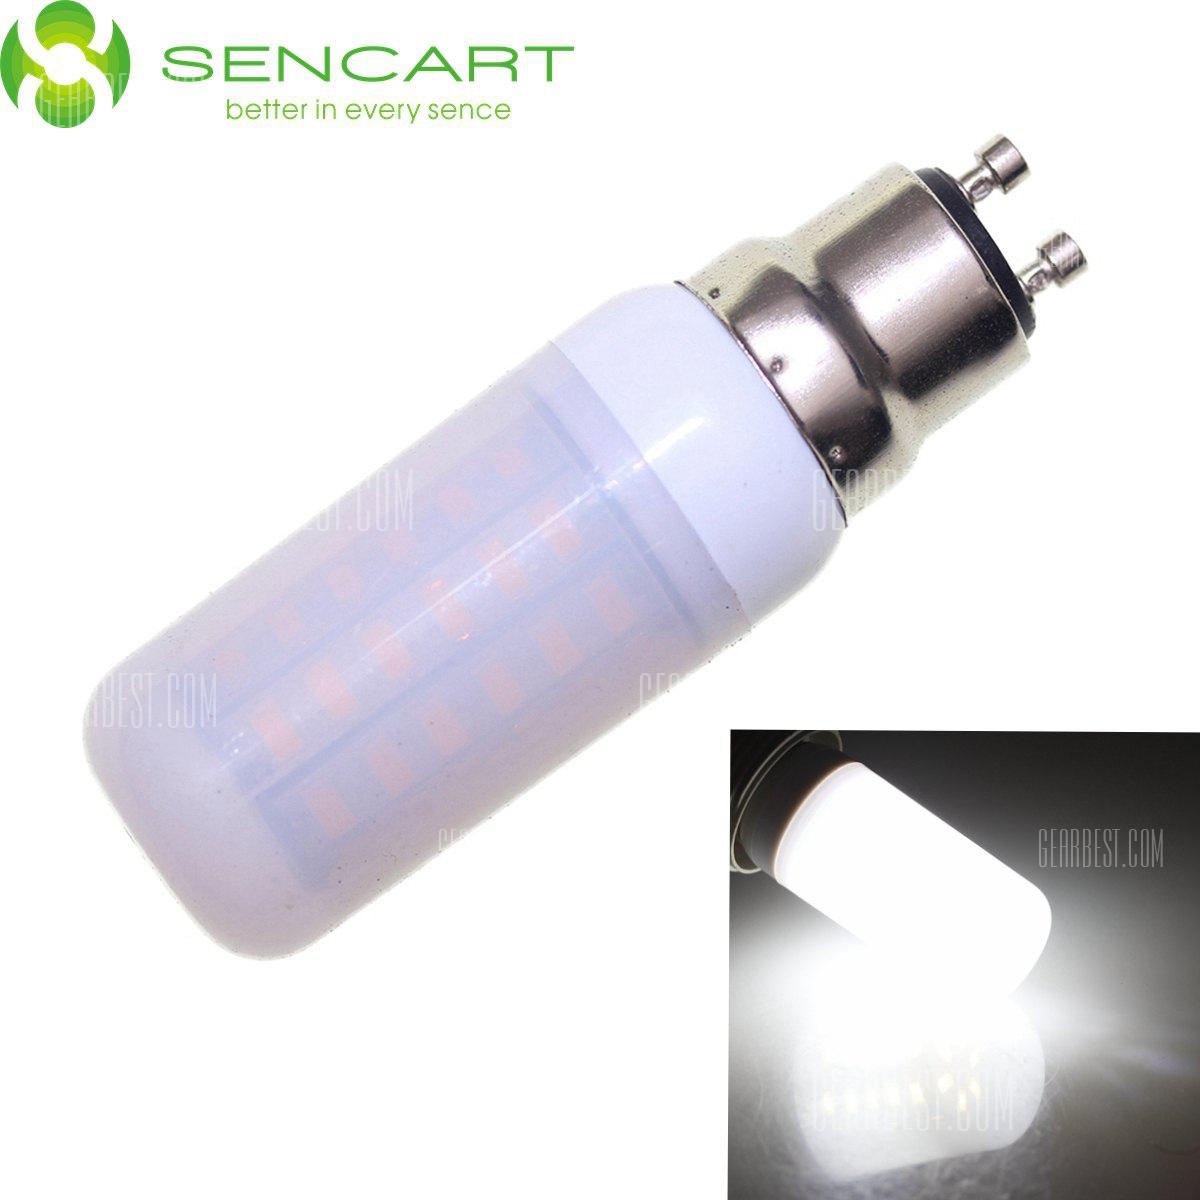 Sencart GU10 12W SMD - 5730 56 LED Lampara Luz LED blanca regulable 2200LM CA 110 - 240 V caso mate